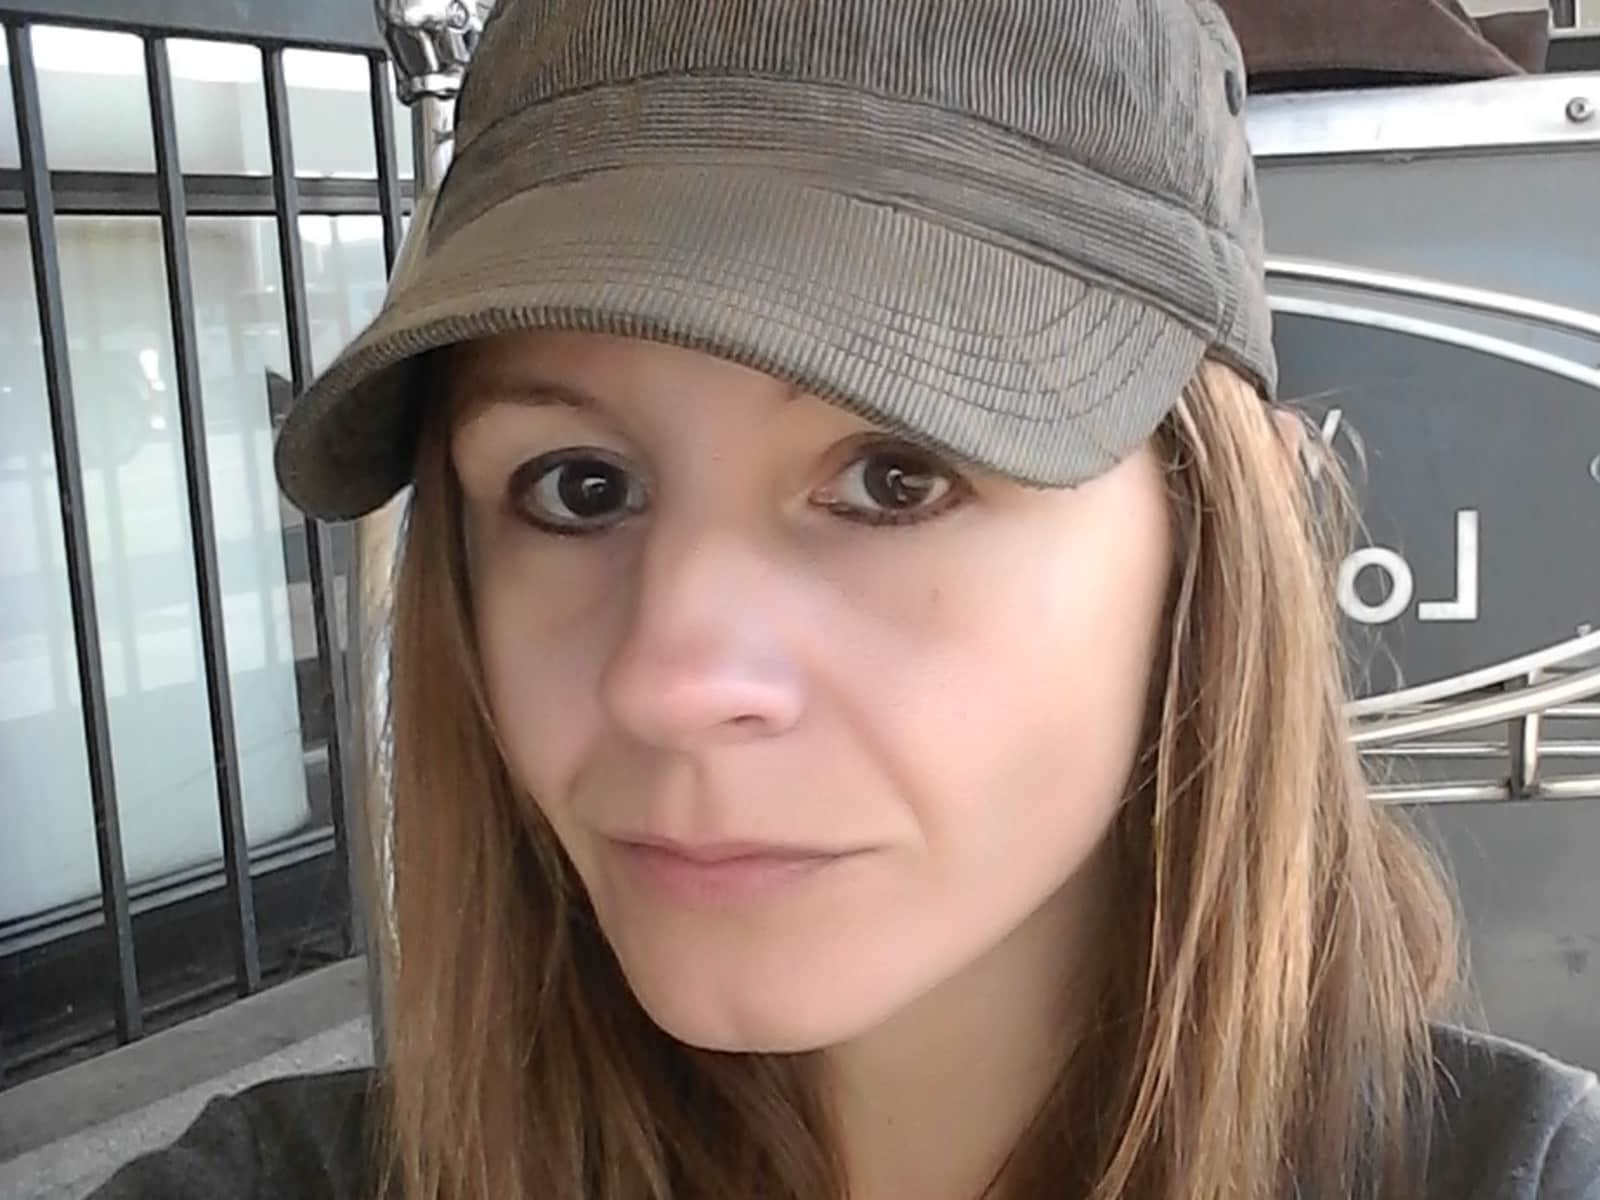 Lisa from Colorado Springs, Colorado, United States